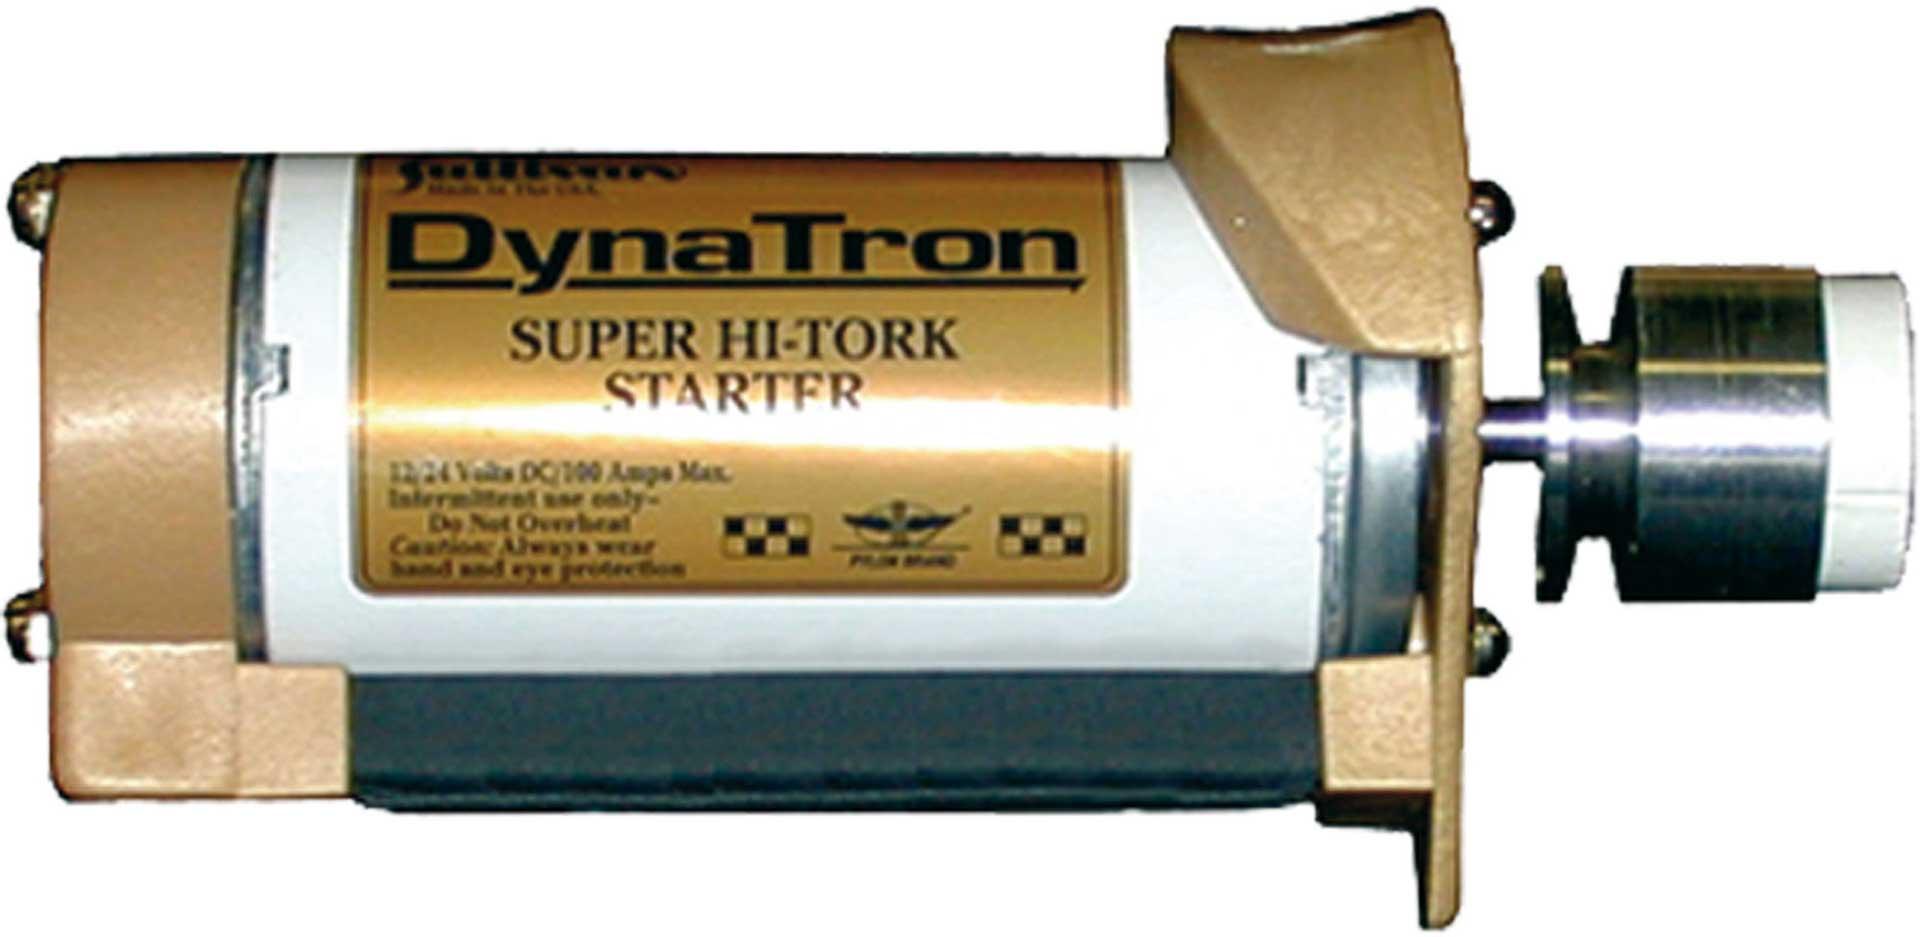 SULLIVAN E-STARTER DYNATRON SUPER-HI-TORK